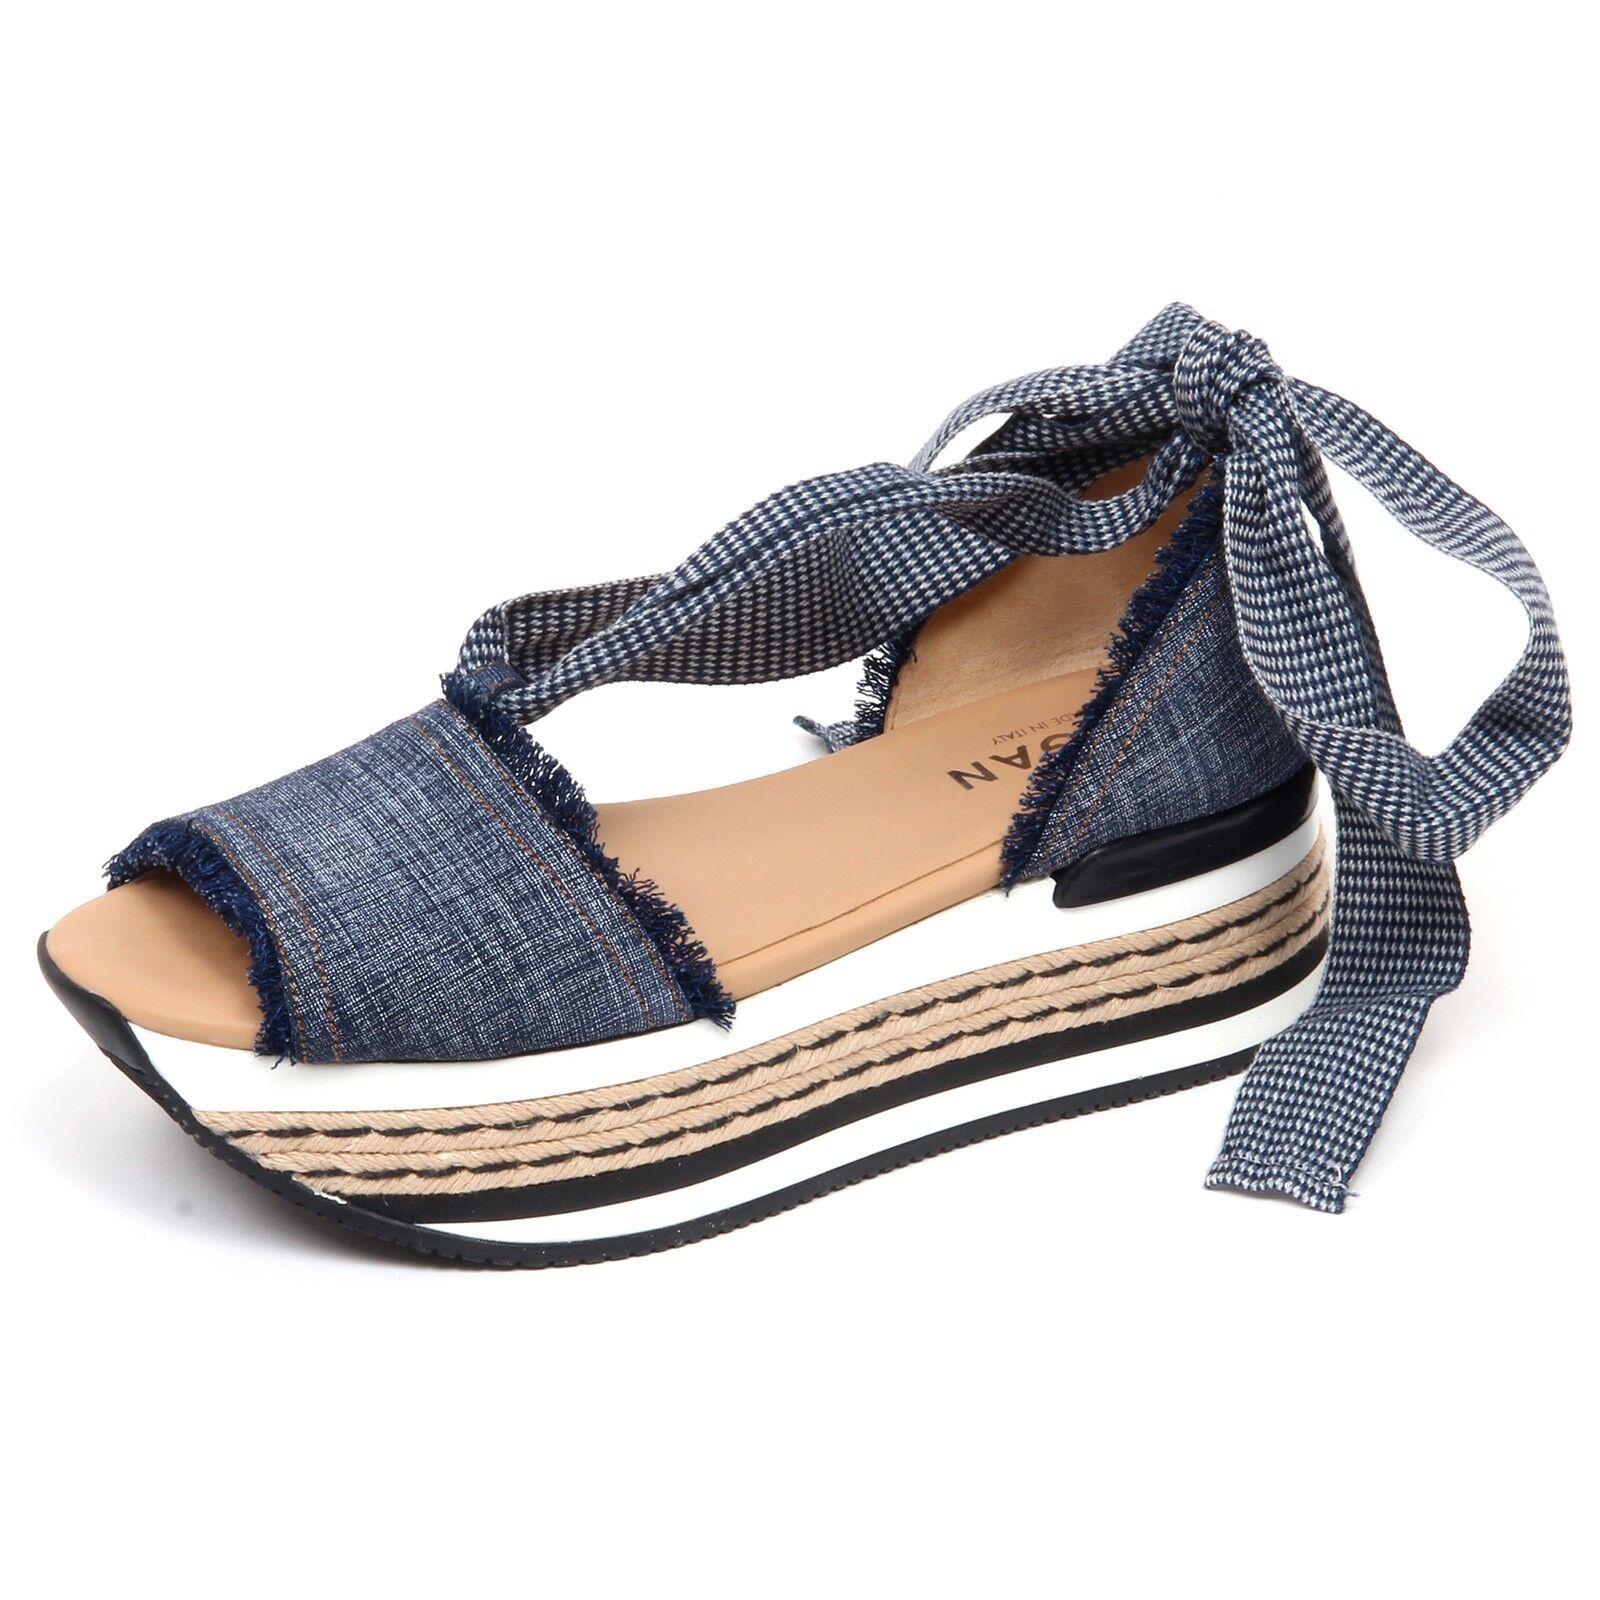 F4134 sandalo mujer tissue azul Jeans Hogan h360 zapatos Sandal Sandal Sandal zapatos Woman  solo cómpralo